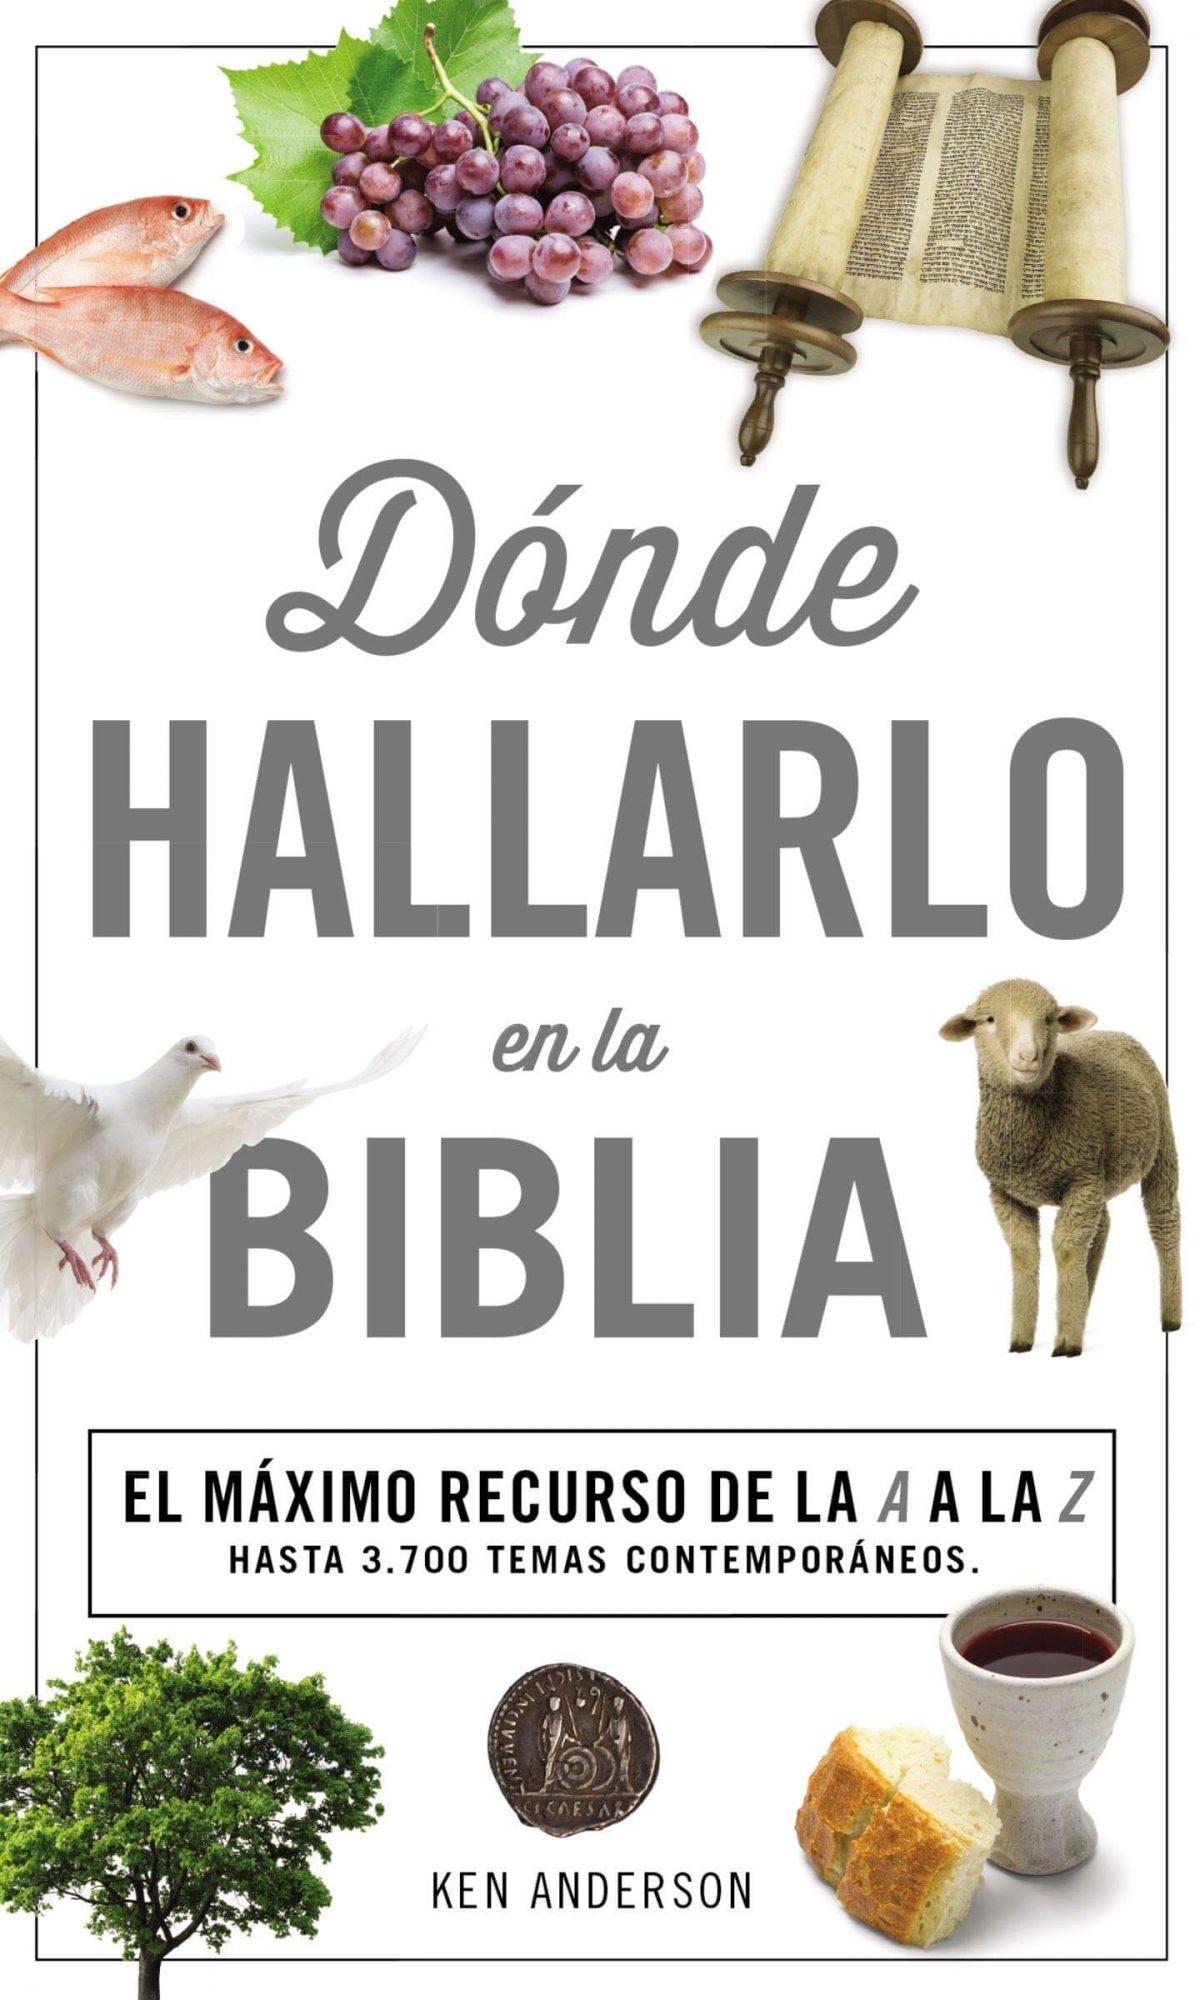 DONDE HALLARLO EN LA BIBLIA (BOLSILLO)